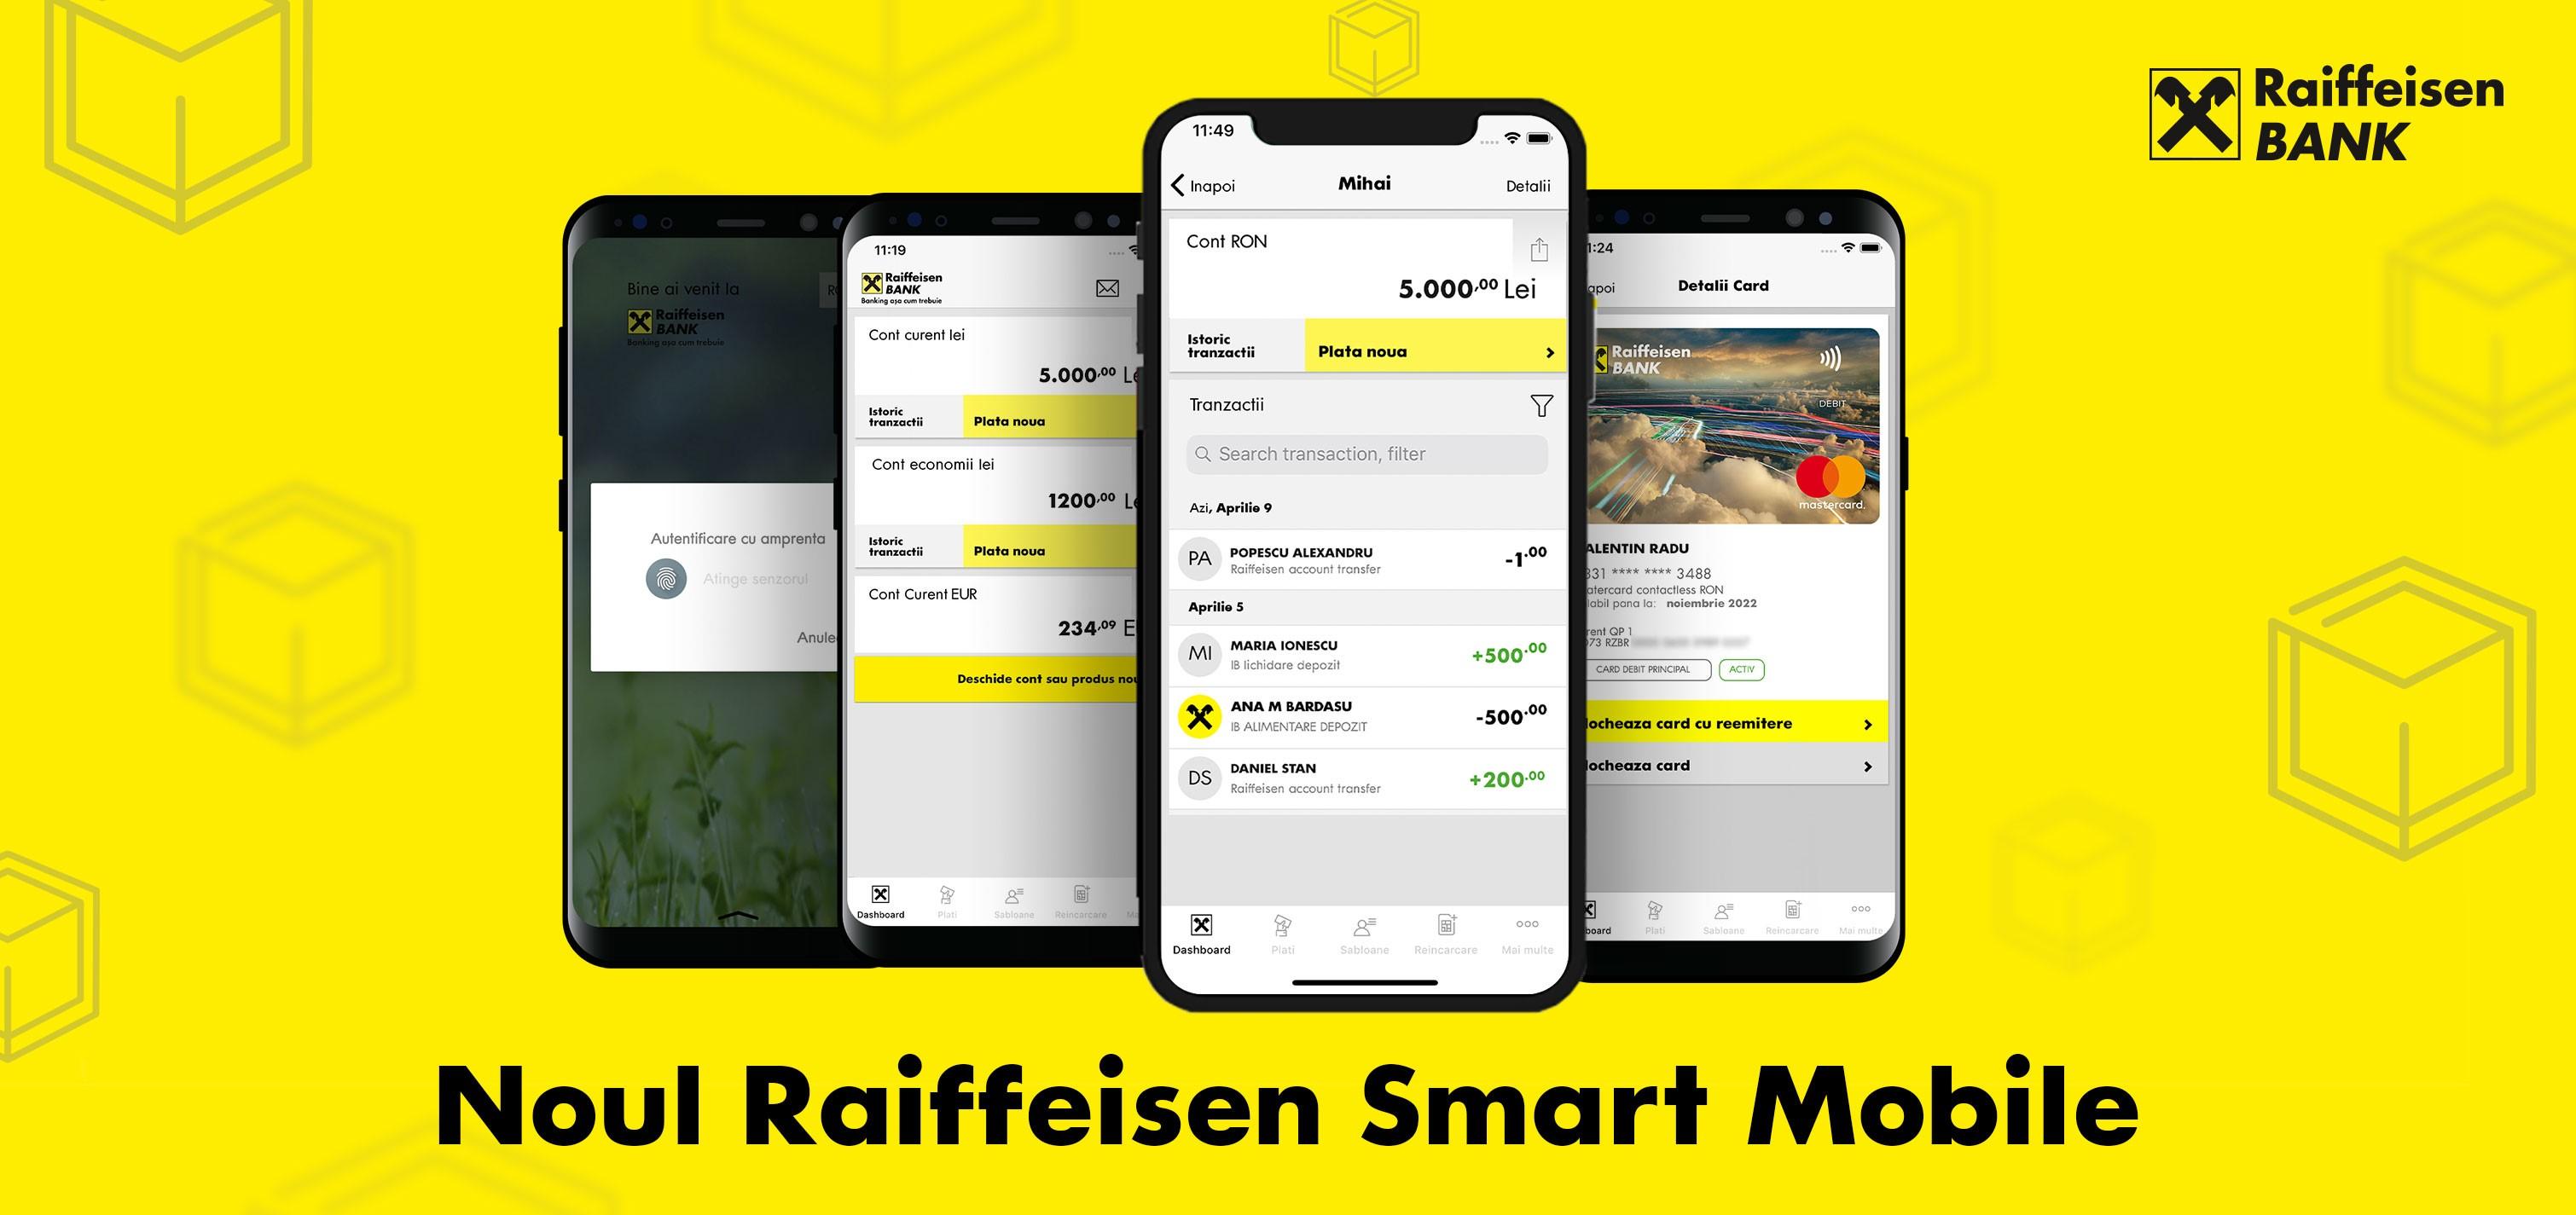 Raiffeisen Bank a lansat noile aplicaţii de mobile şi internet banking